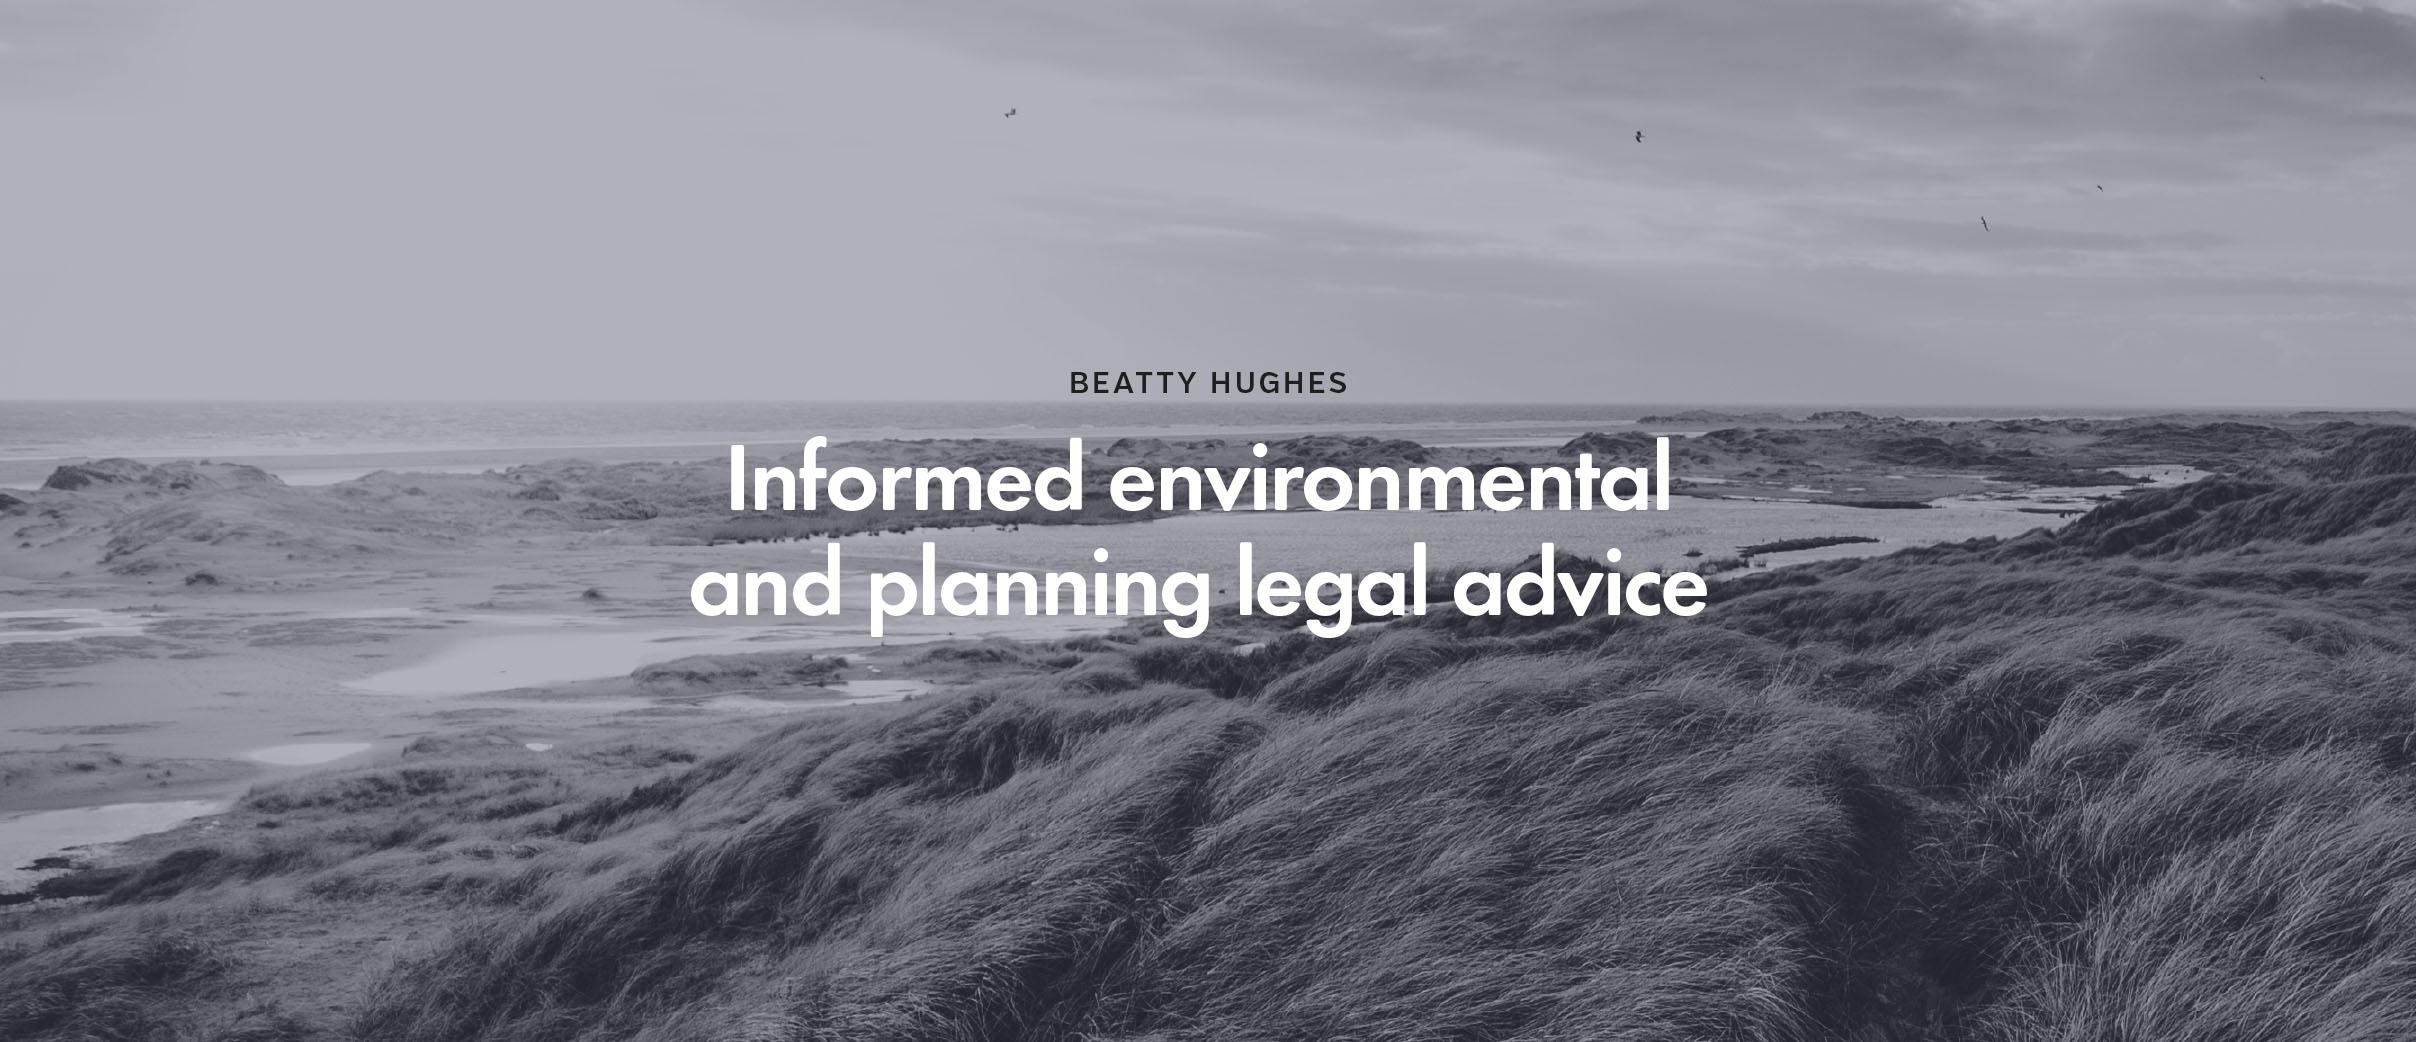 Beatty Hughes Sydney environment law firm